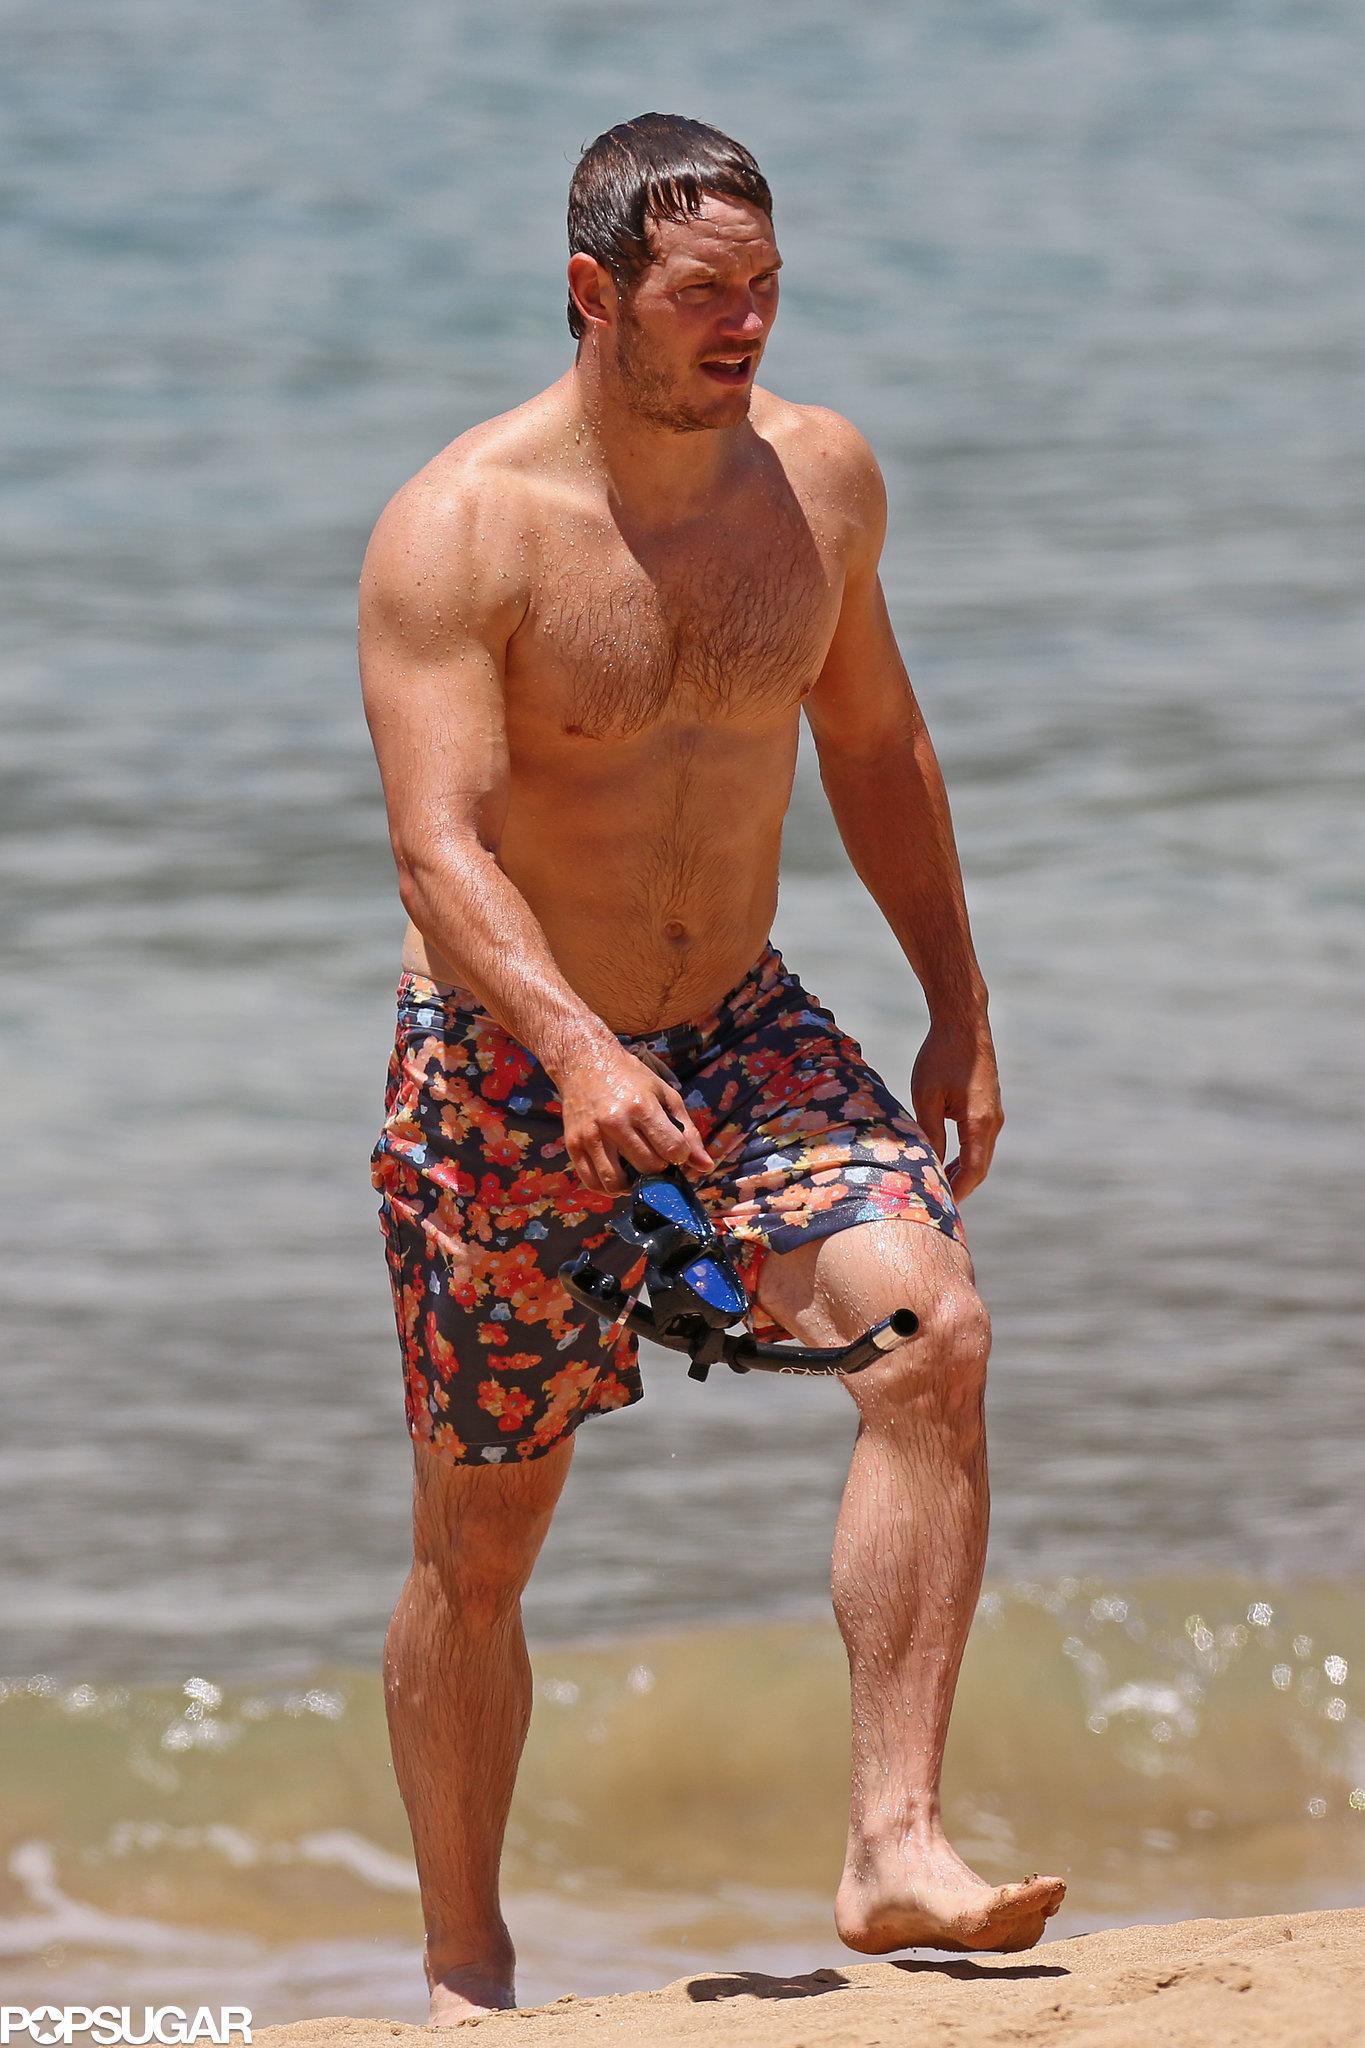 34: Chris Pratt